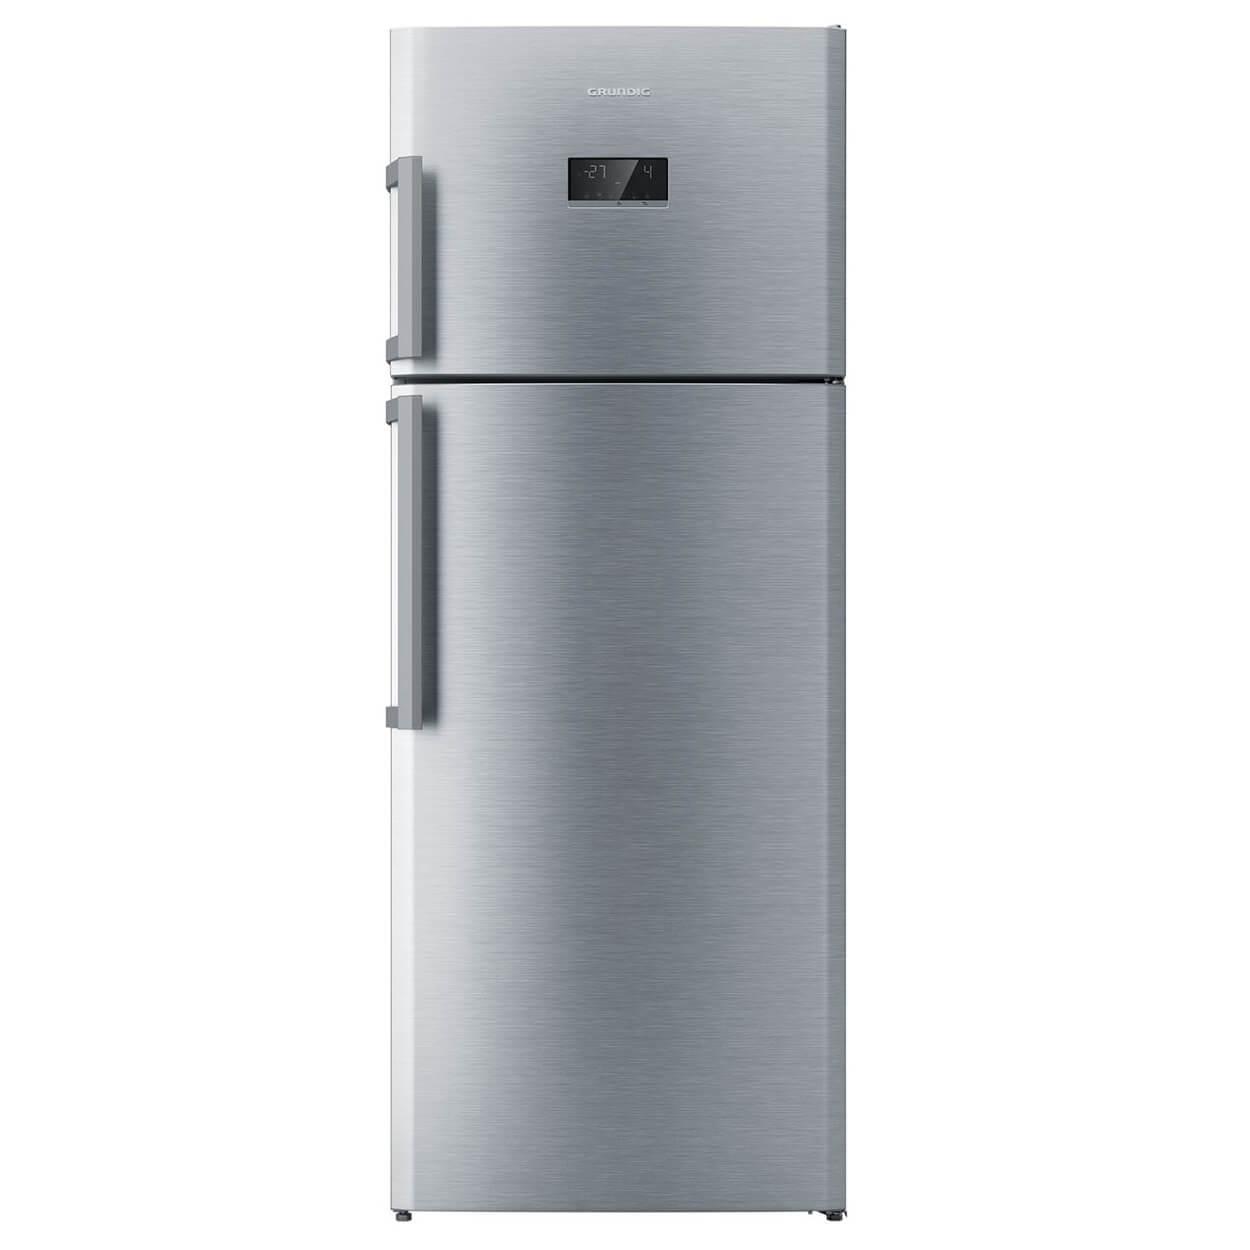 Grundig GRND 5100 I buzdolabi